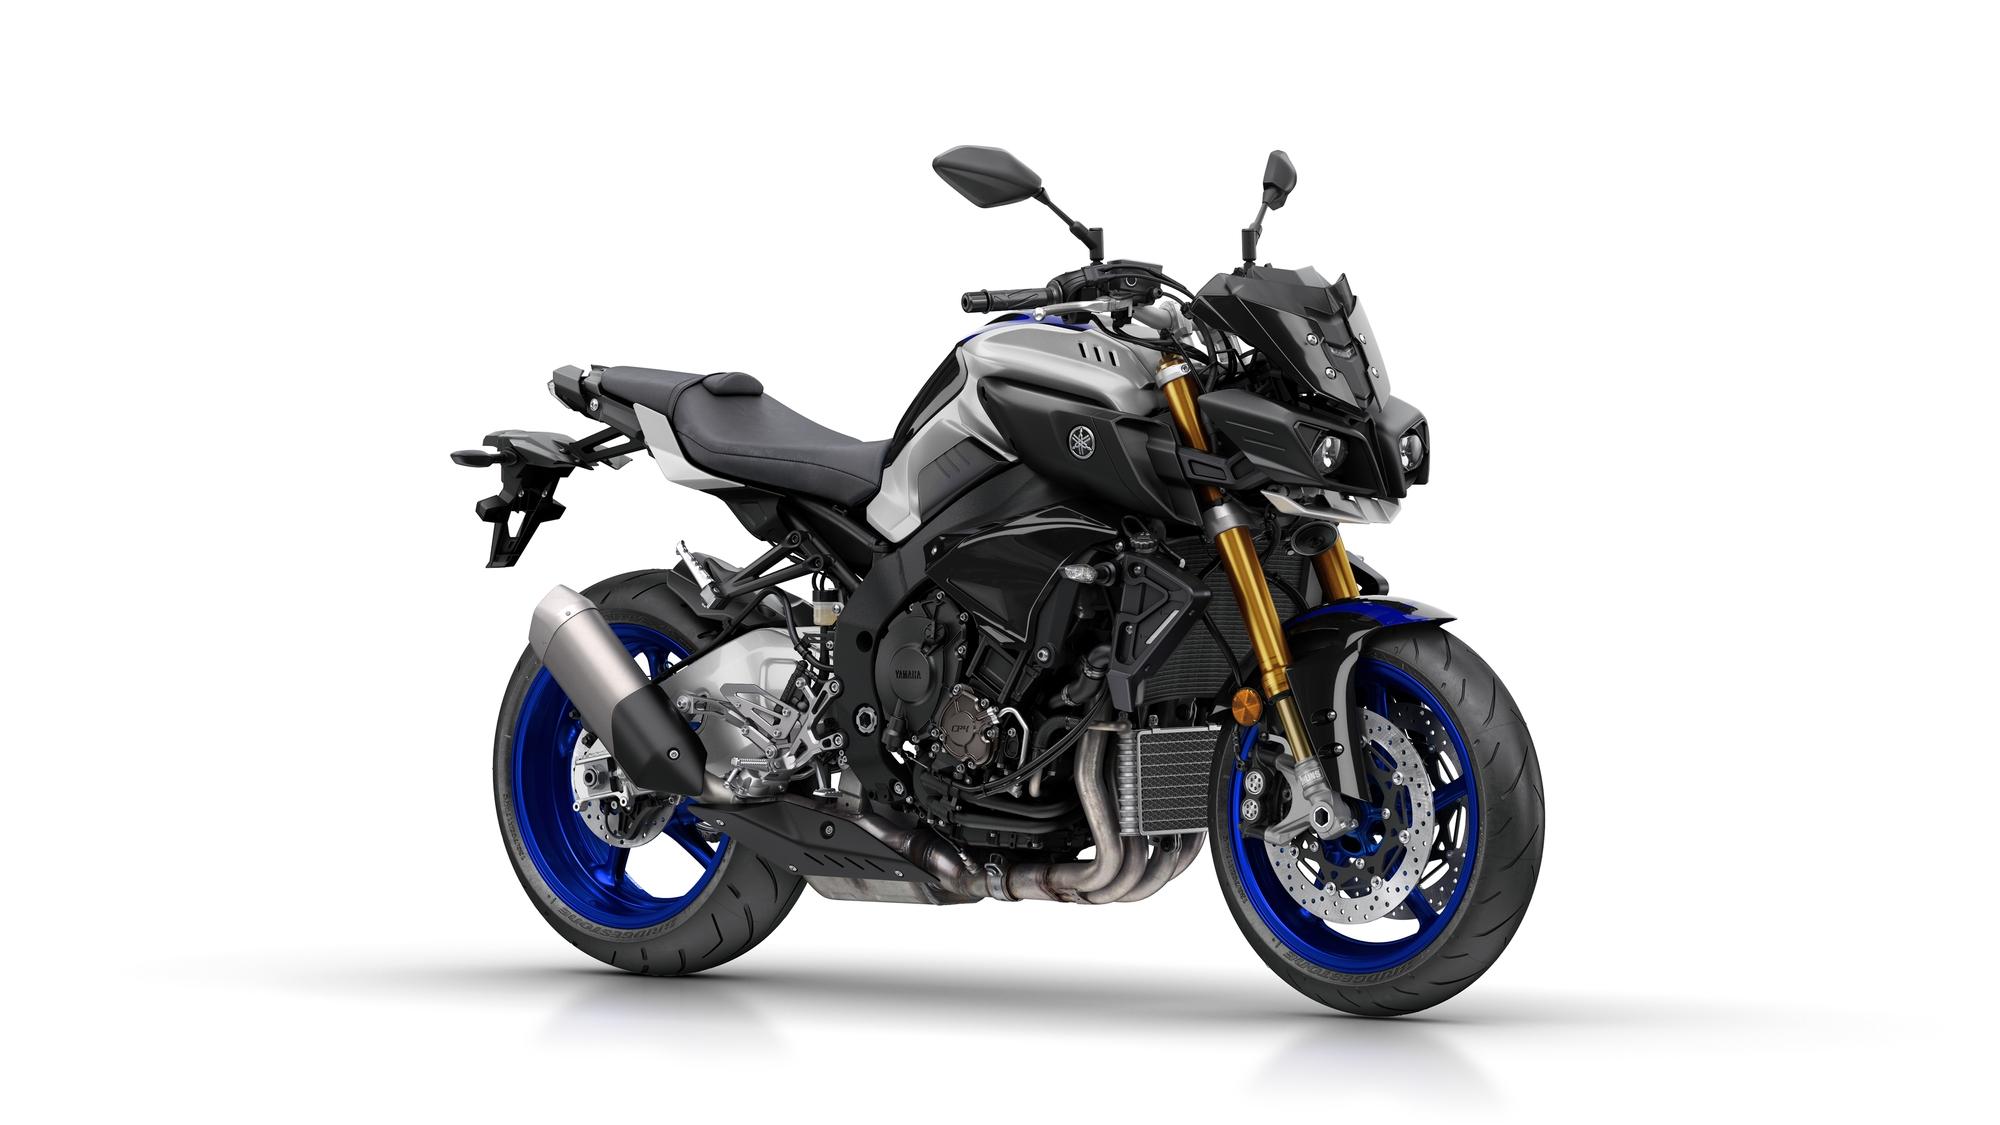 2017-Yamaha-MT10DX-EU-Silver_Blu_Carbon-Studio-001-03